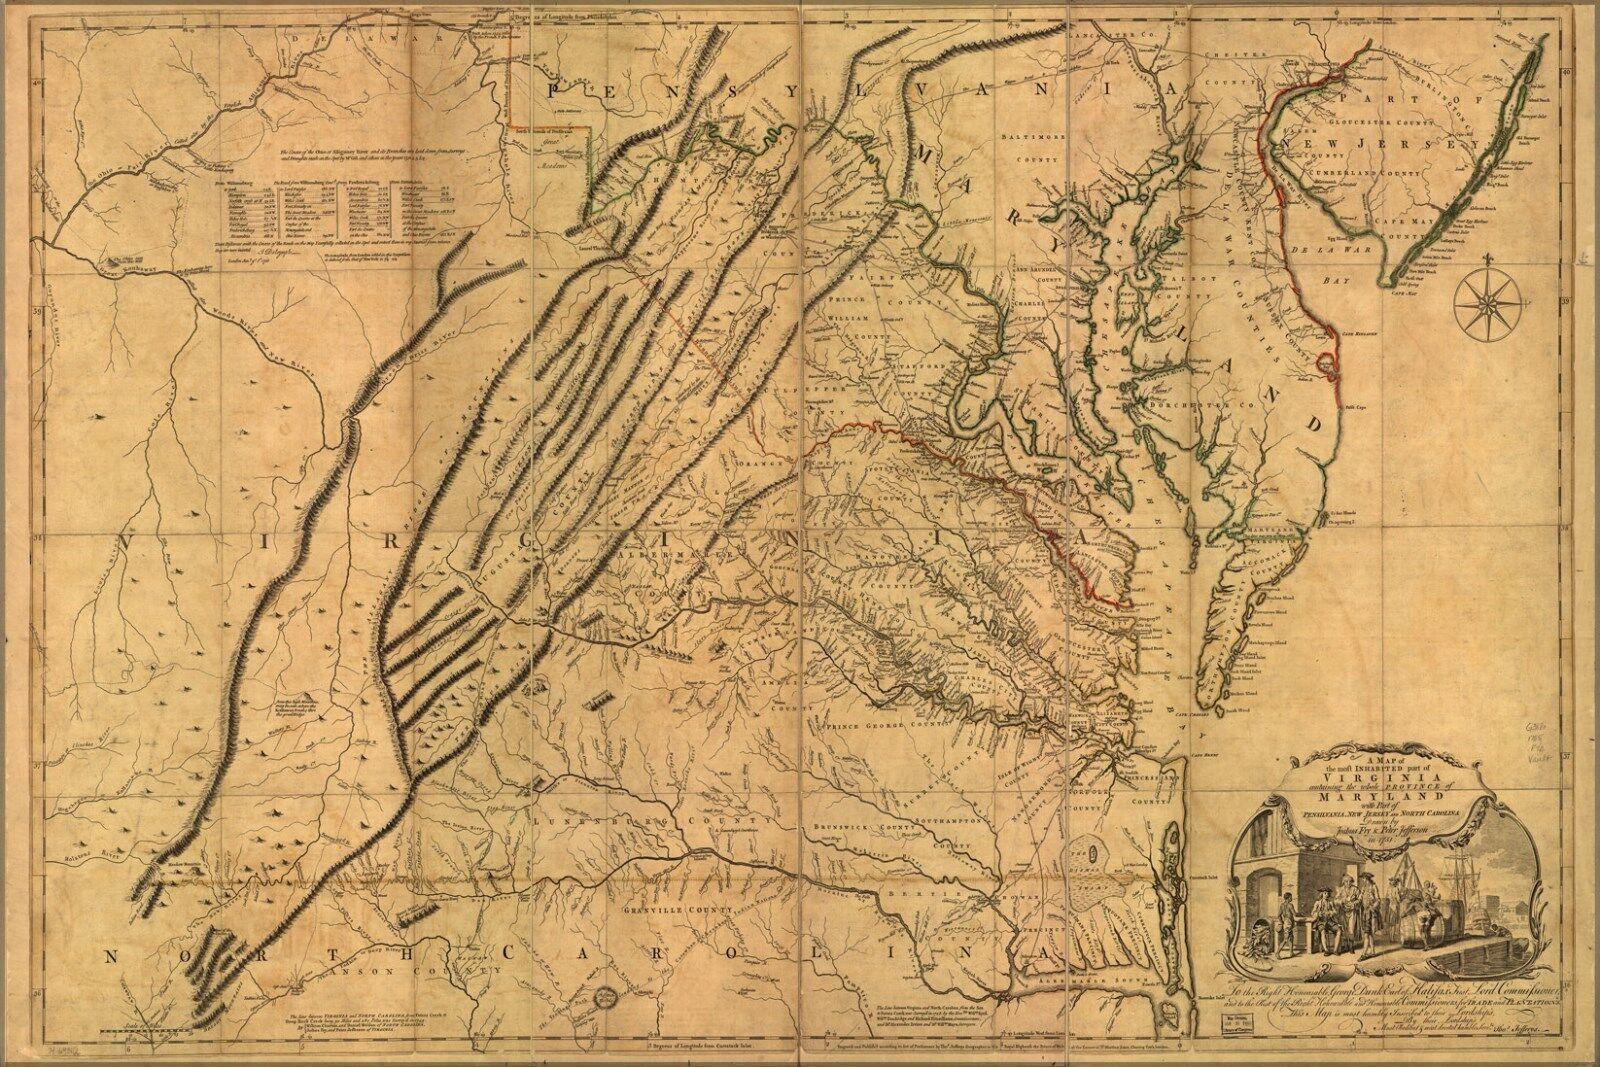 Poster, Many Größes; Map Of Virginia & Maryland 1755